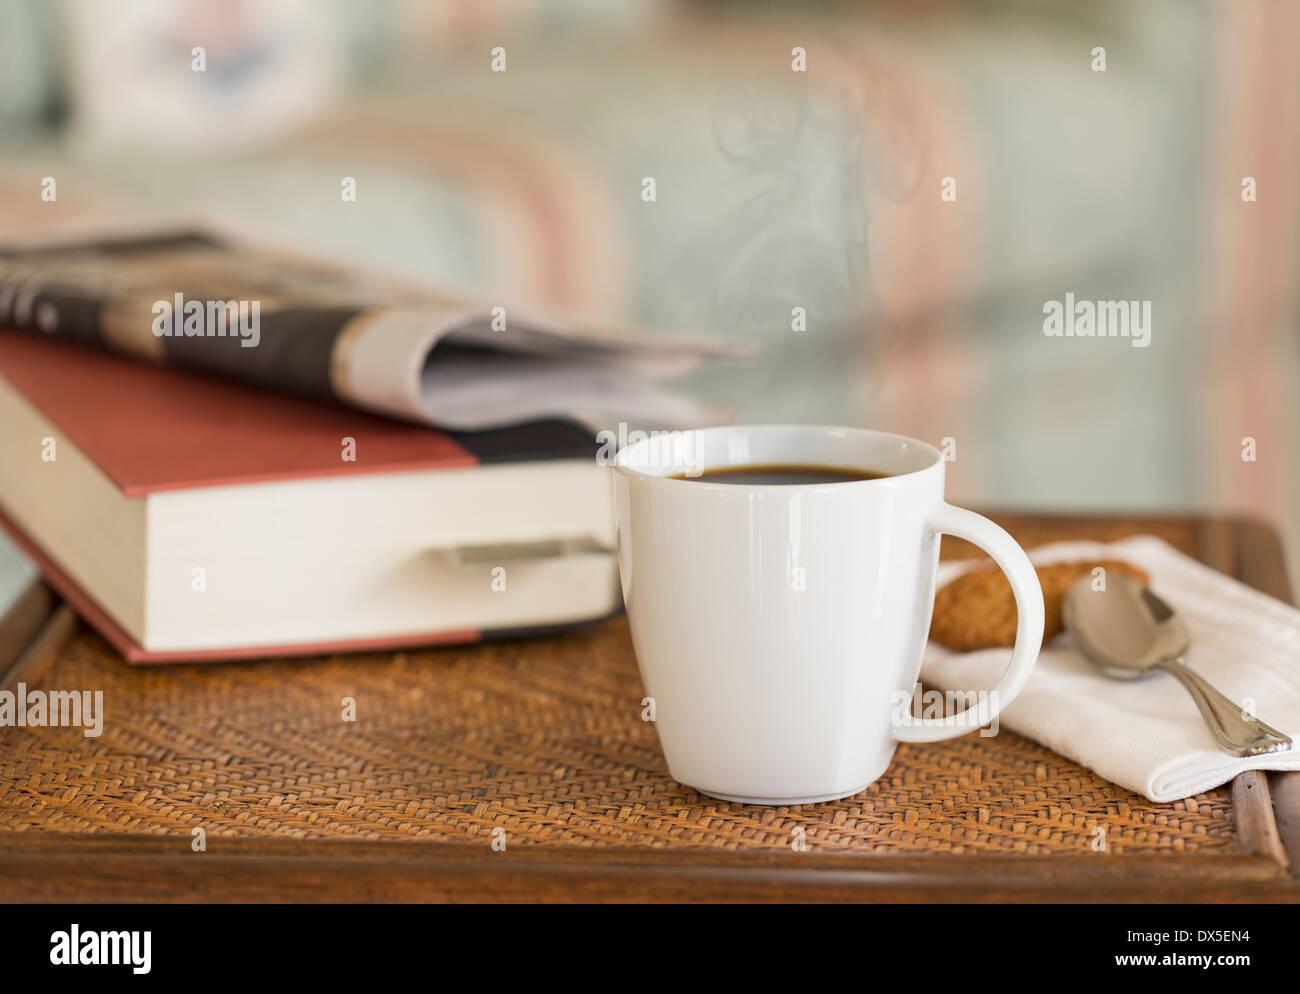 Interrupción temporal de café Imagen De Stock